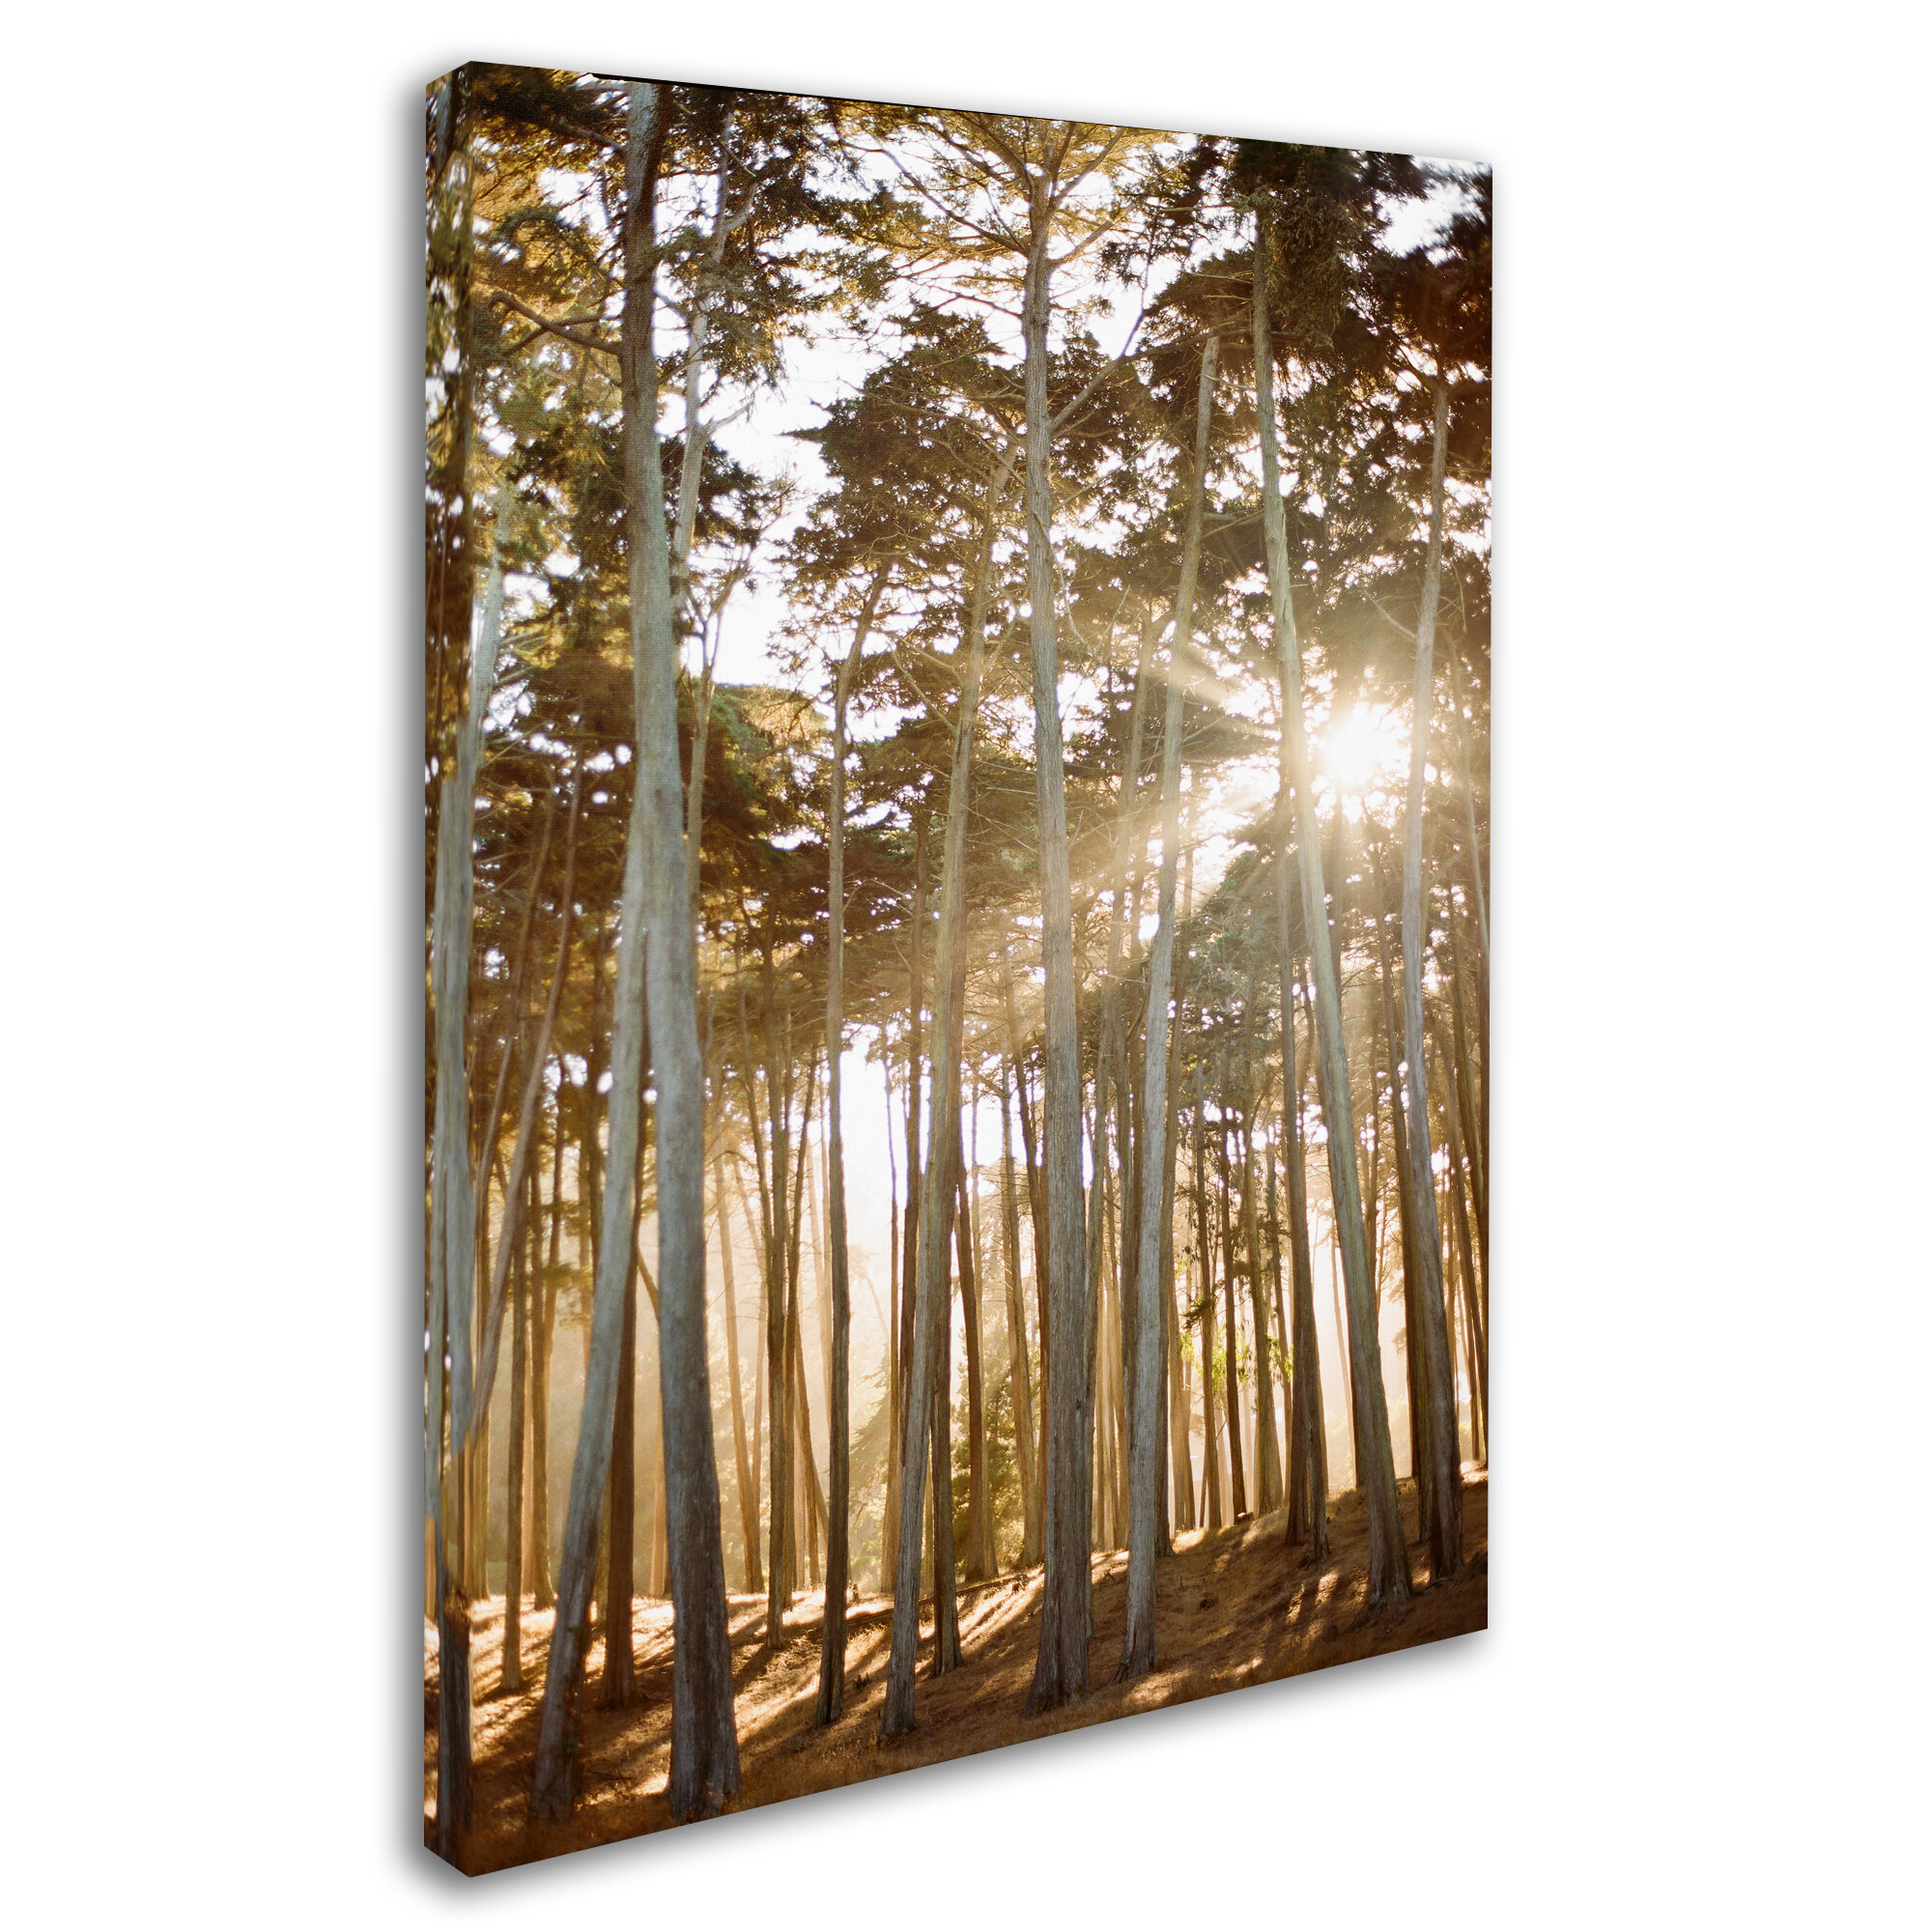 Trademark Art Presidio Sunset Trees By Ariane Moshayedi Photographic Print On Wrapped Canvas Wayfair